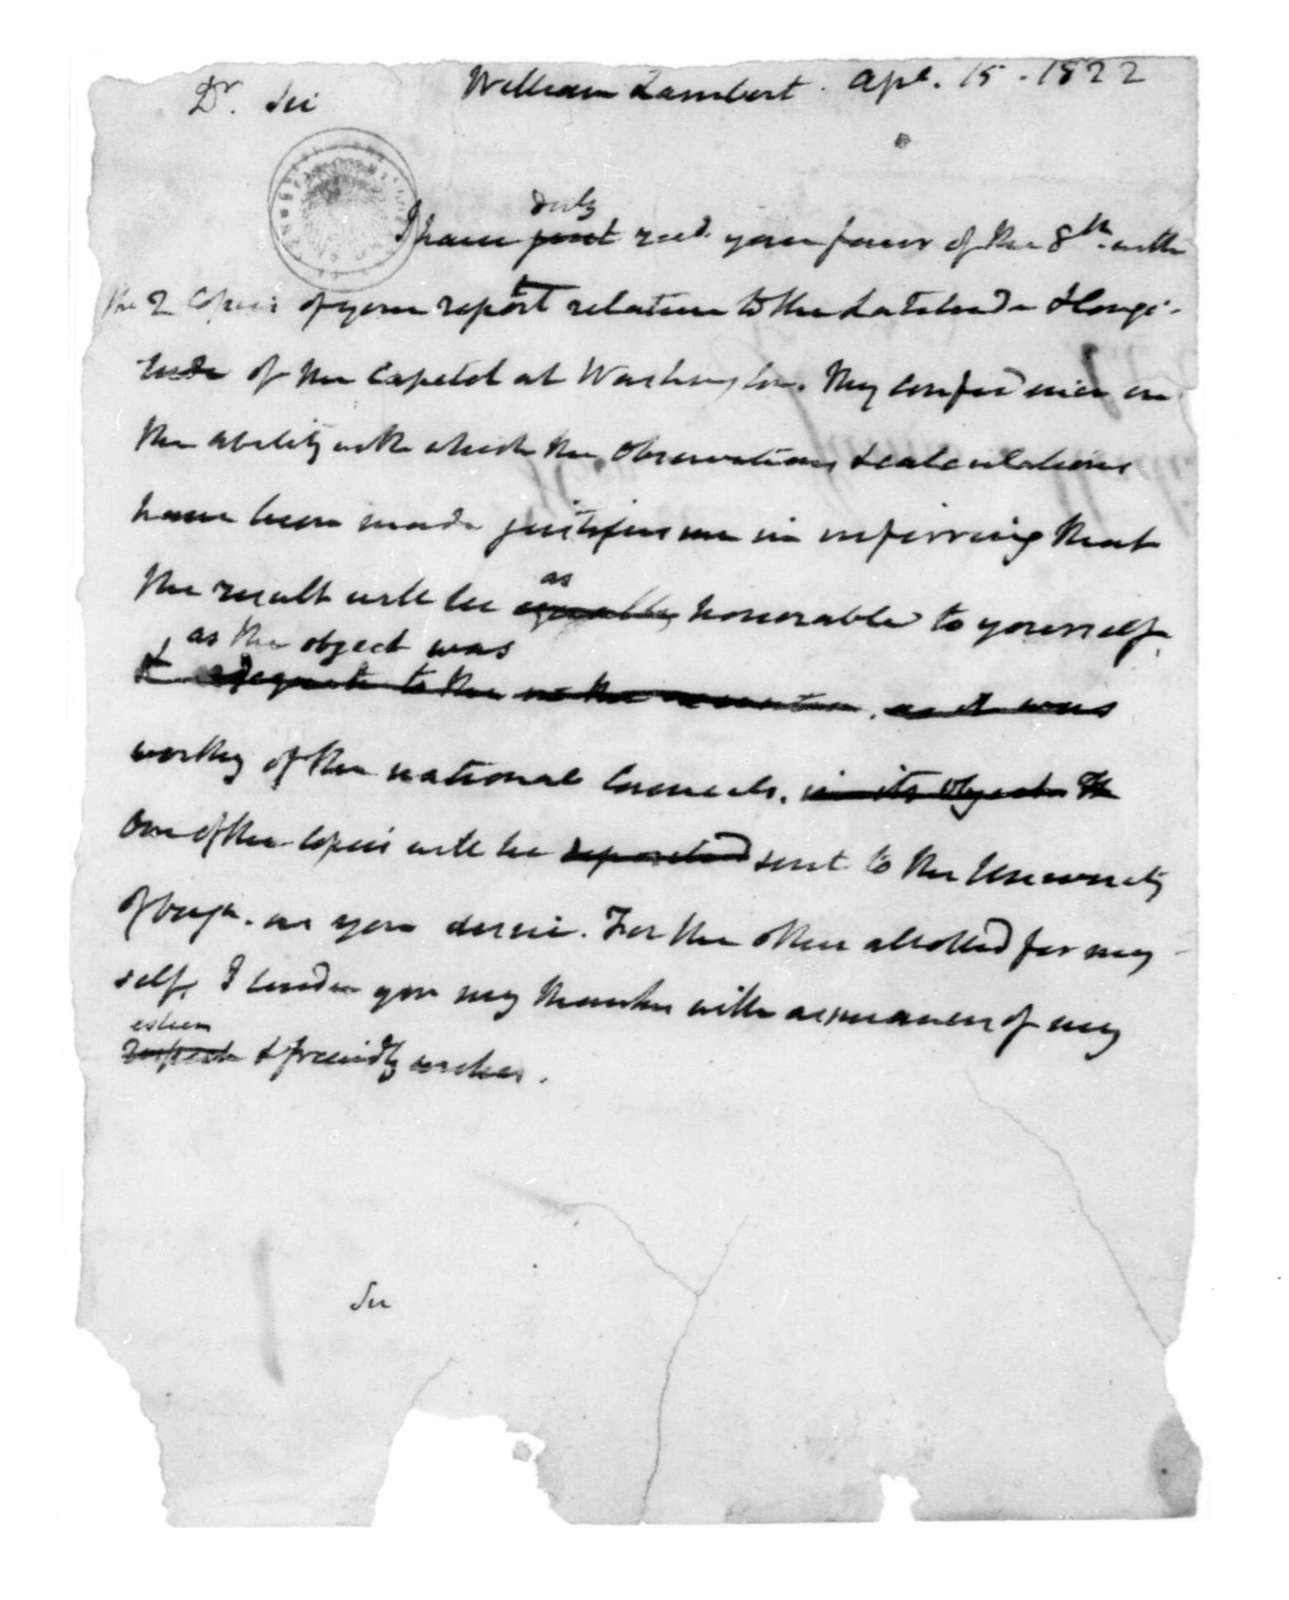 James Madison to William Lambert, April 15, 1822.